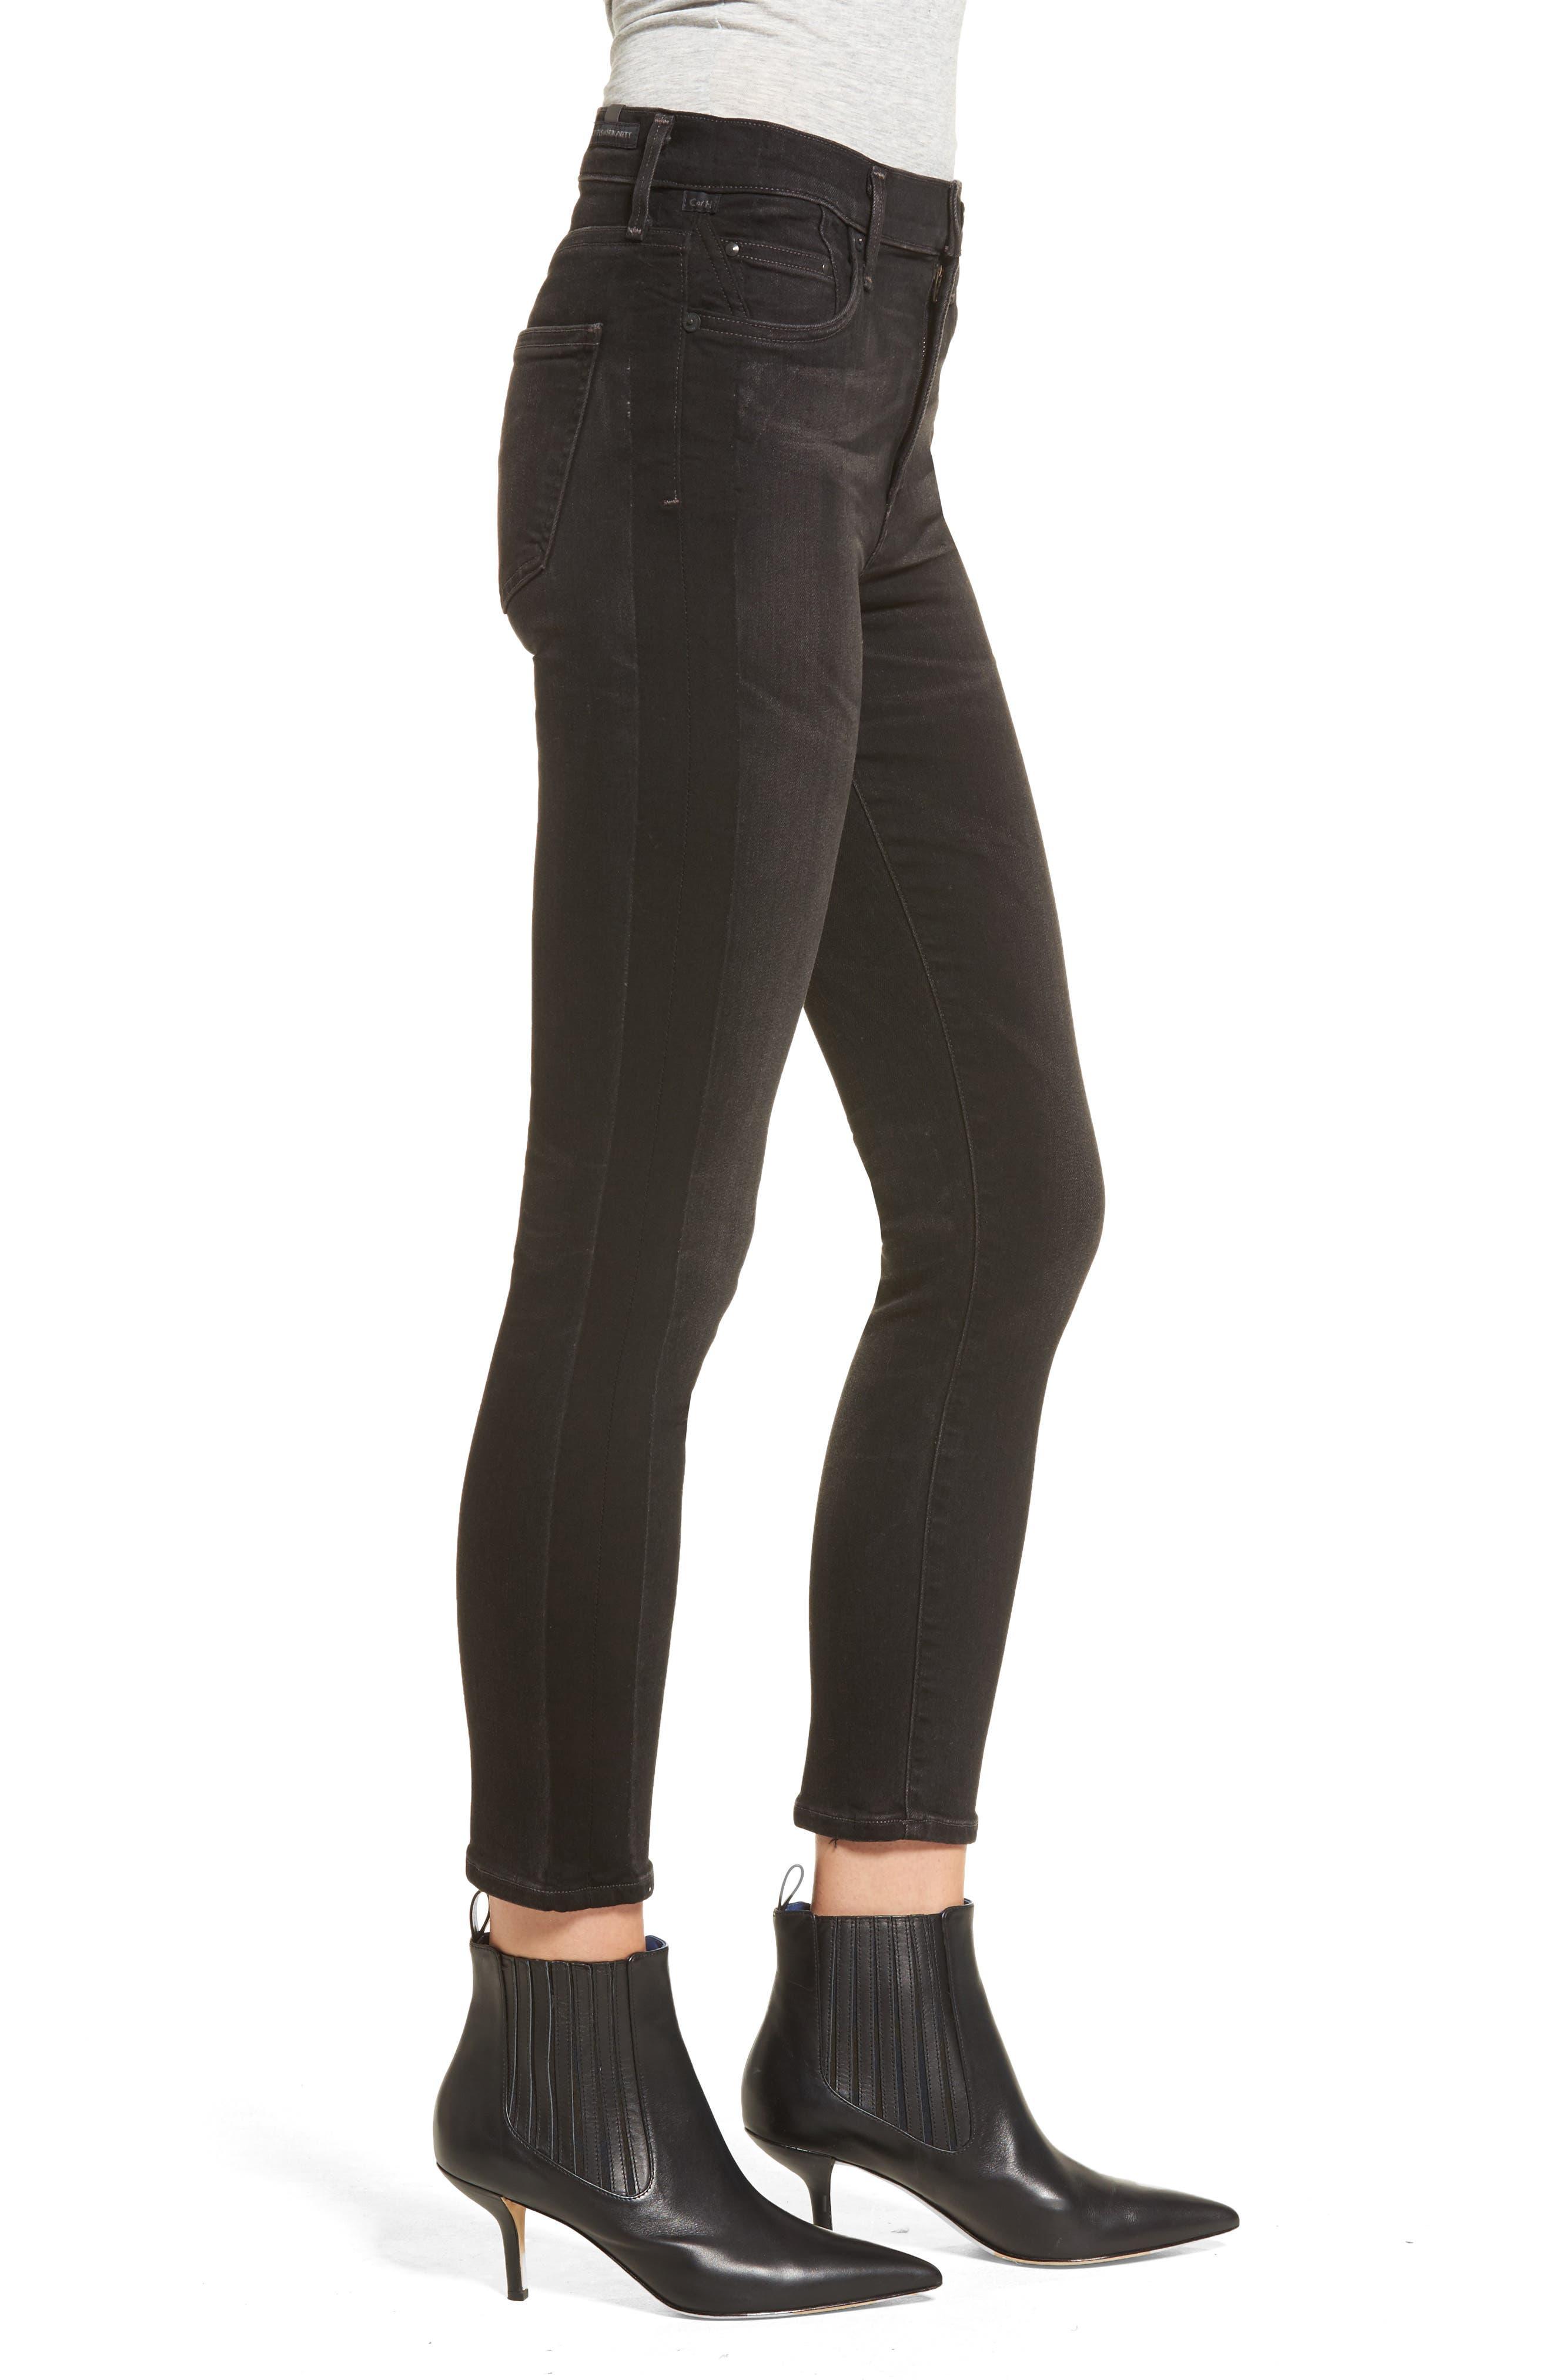 Rocket High Waist Crop Skinny Jeans,                             Alternate thumbnail 3, color,                             009